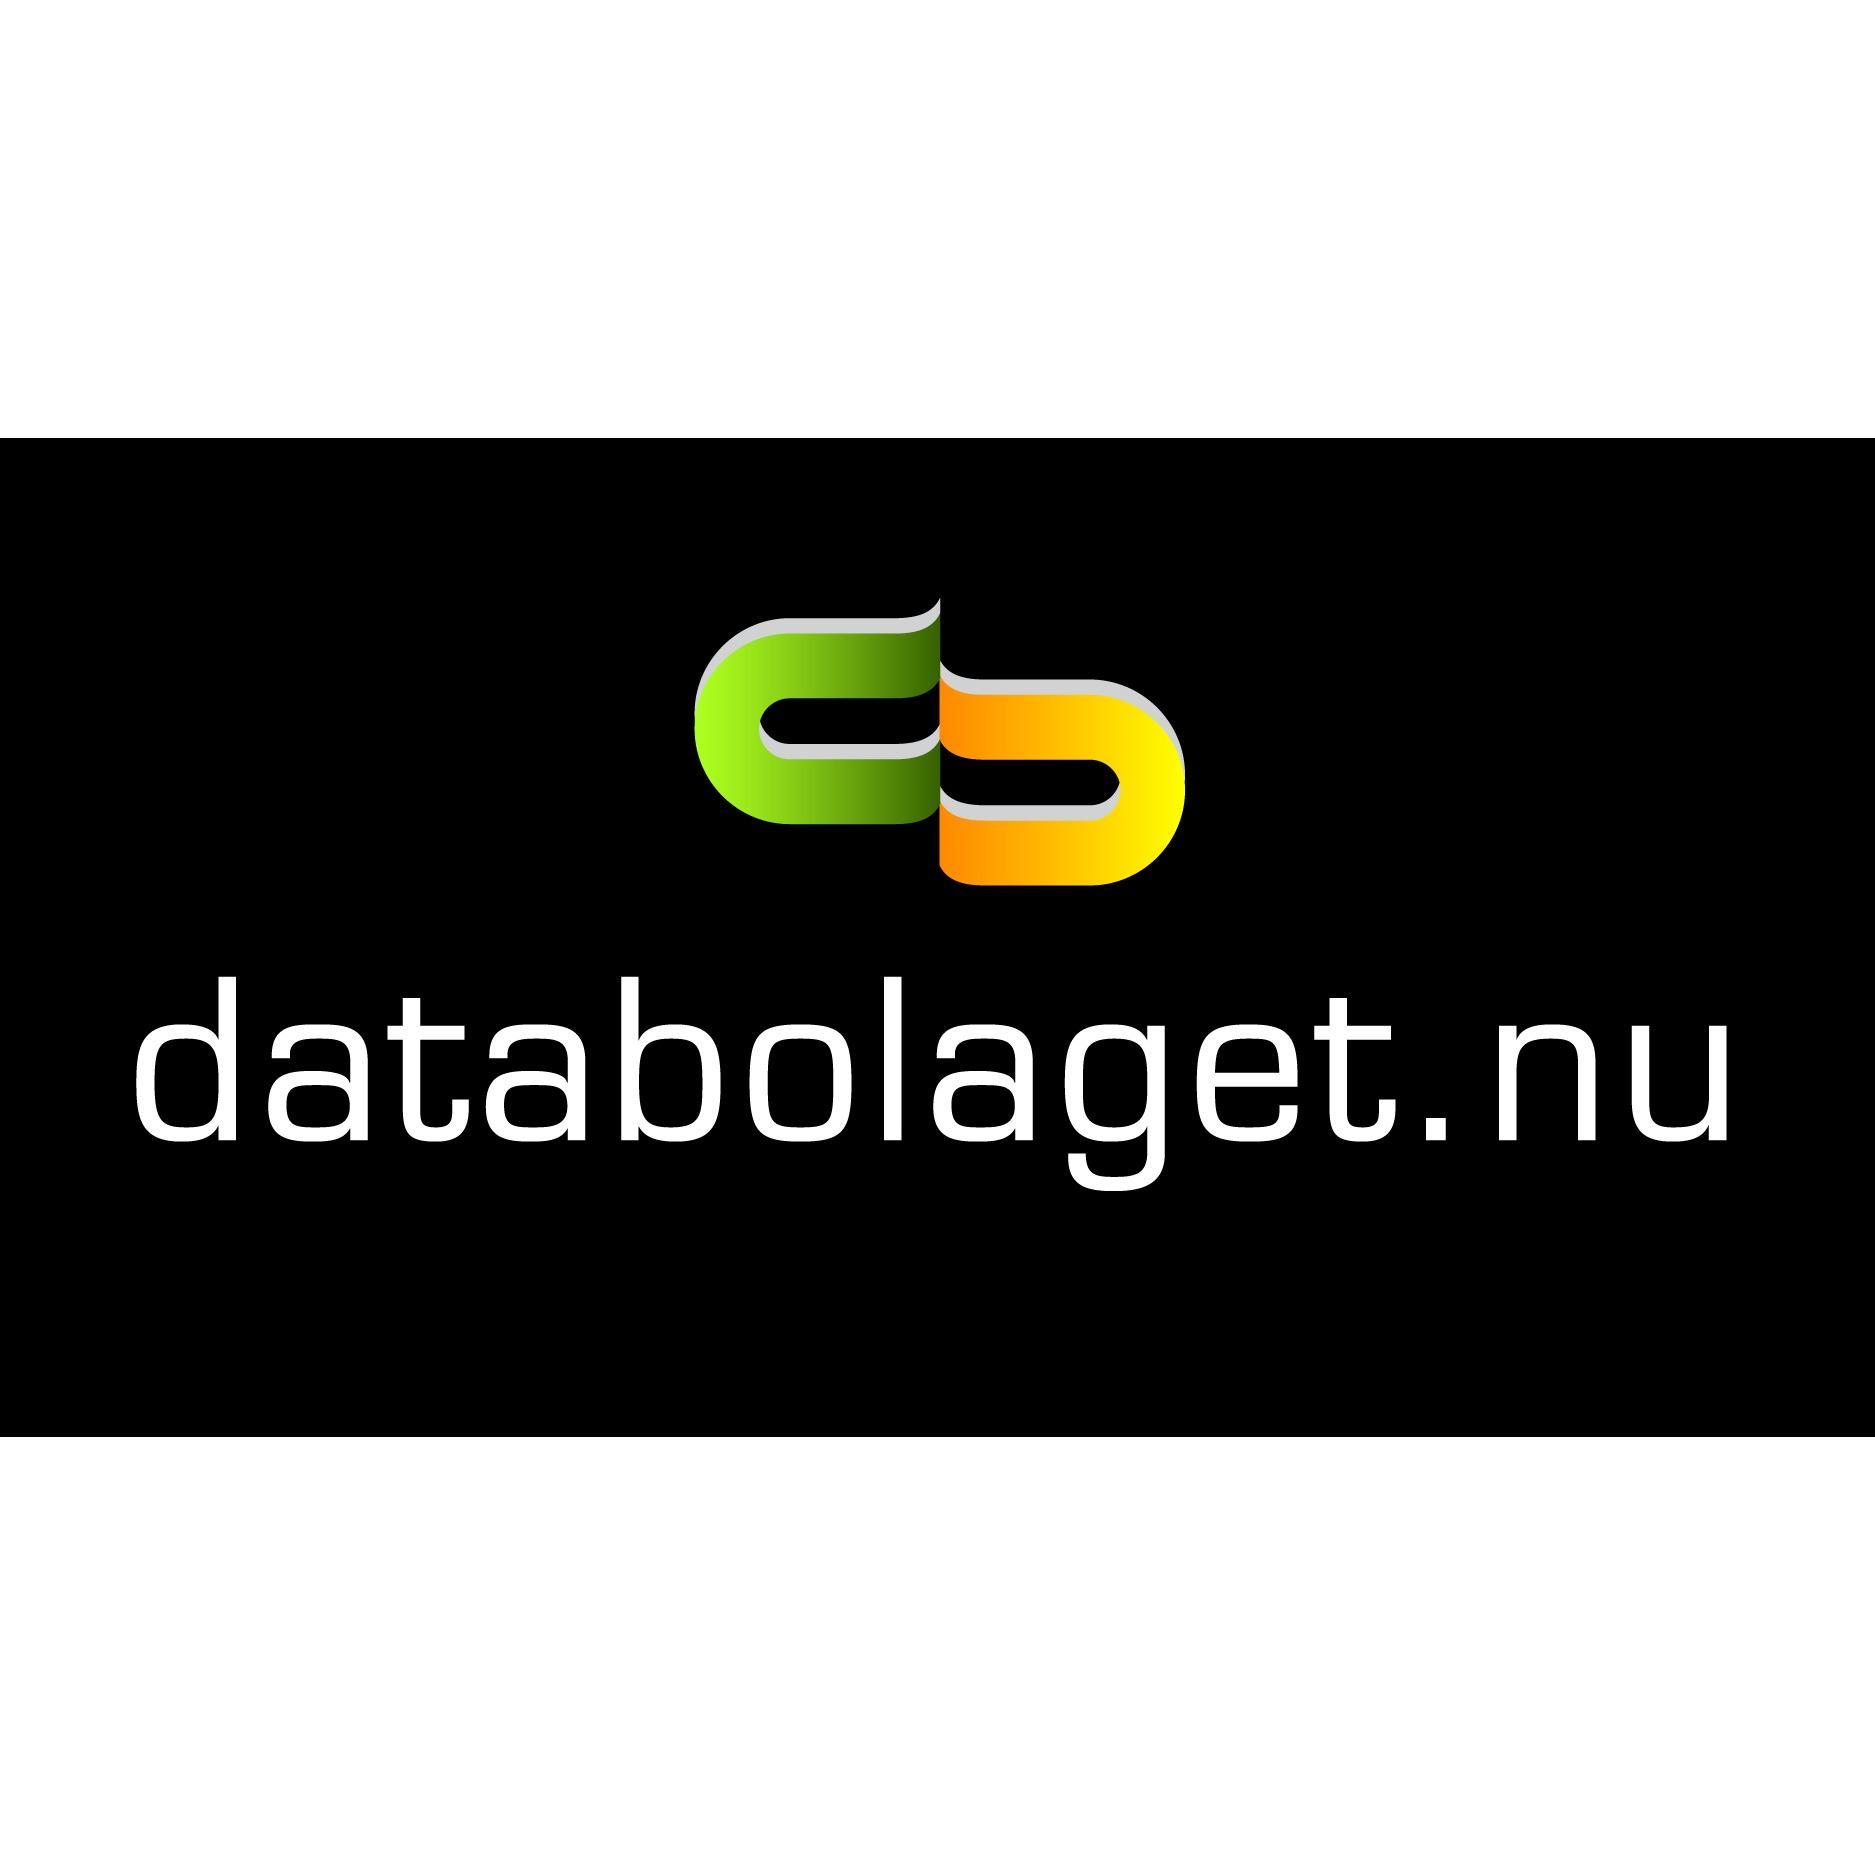 Databolaget i Kristianstad